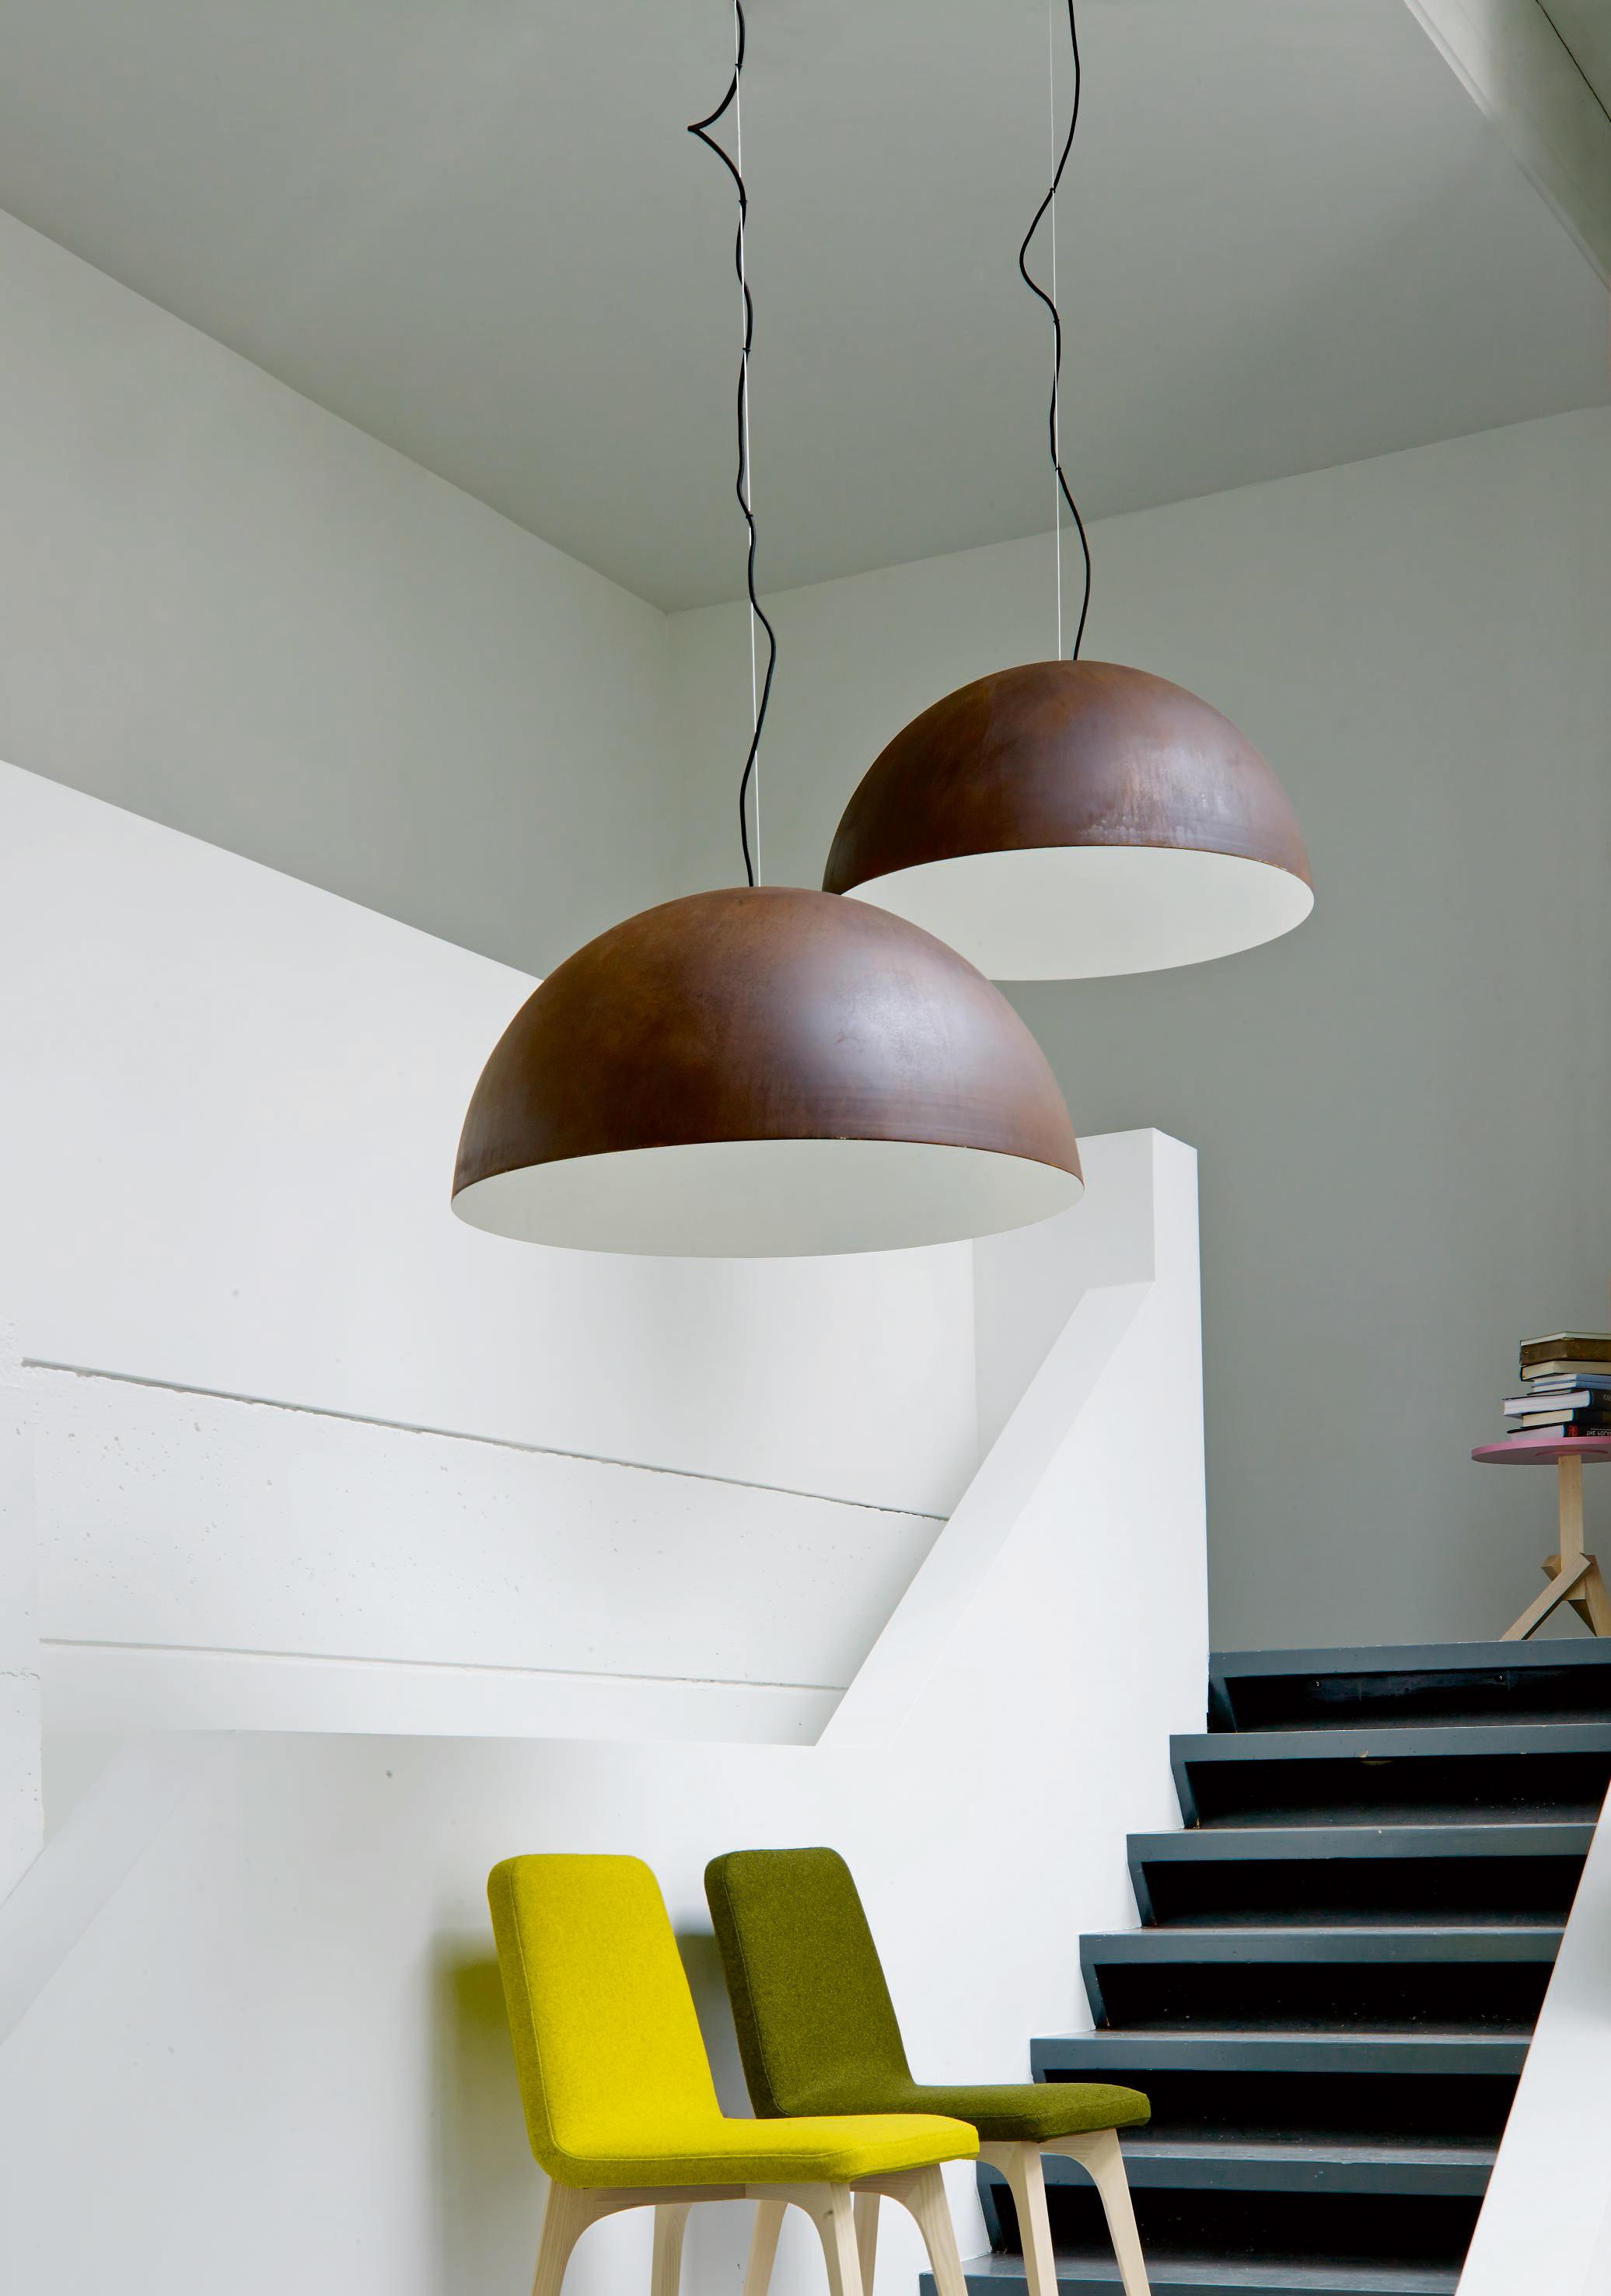 vik stuhl esche hell mit griff st hle von ligne roset architonic. Black Bedroom Furniture Sets. Home Design Ideas